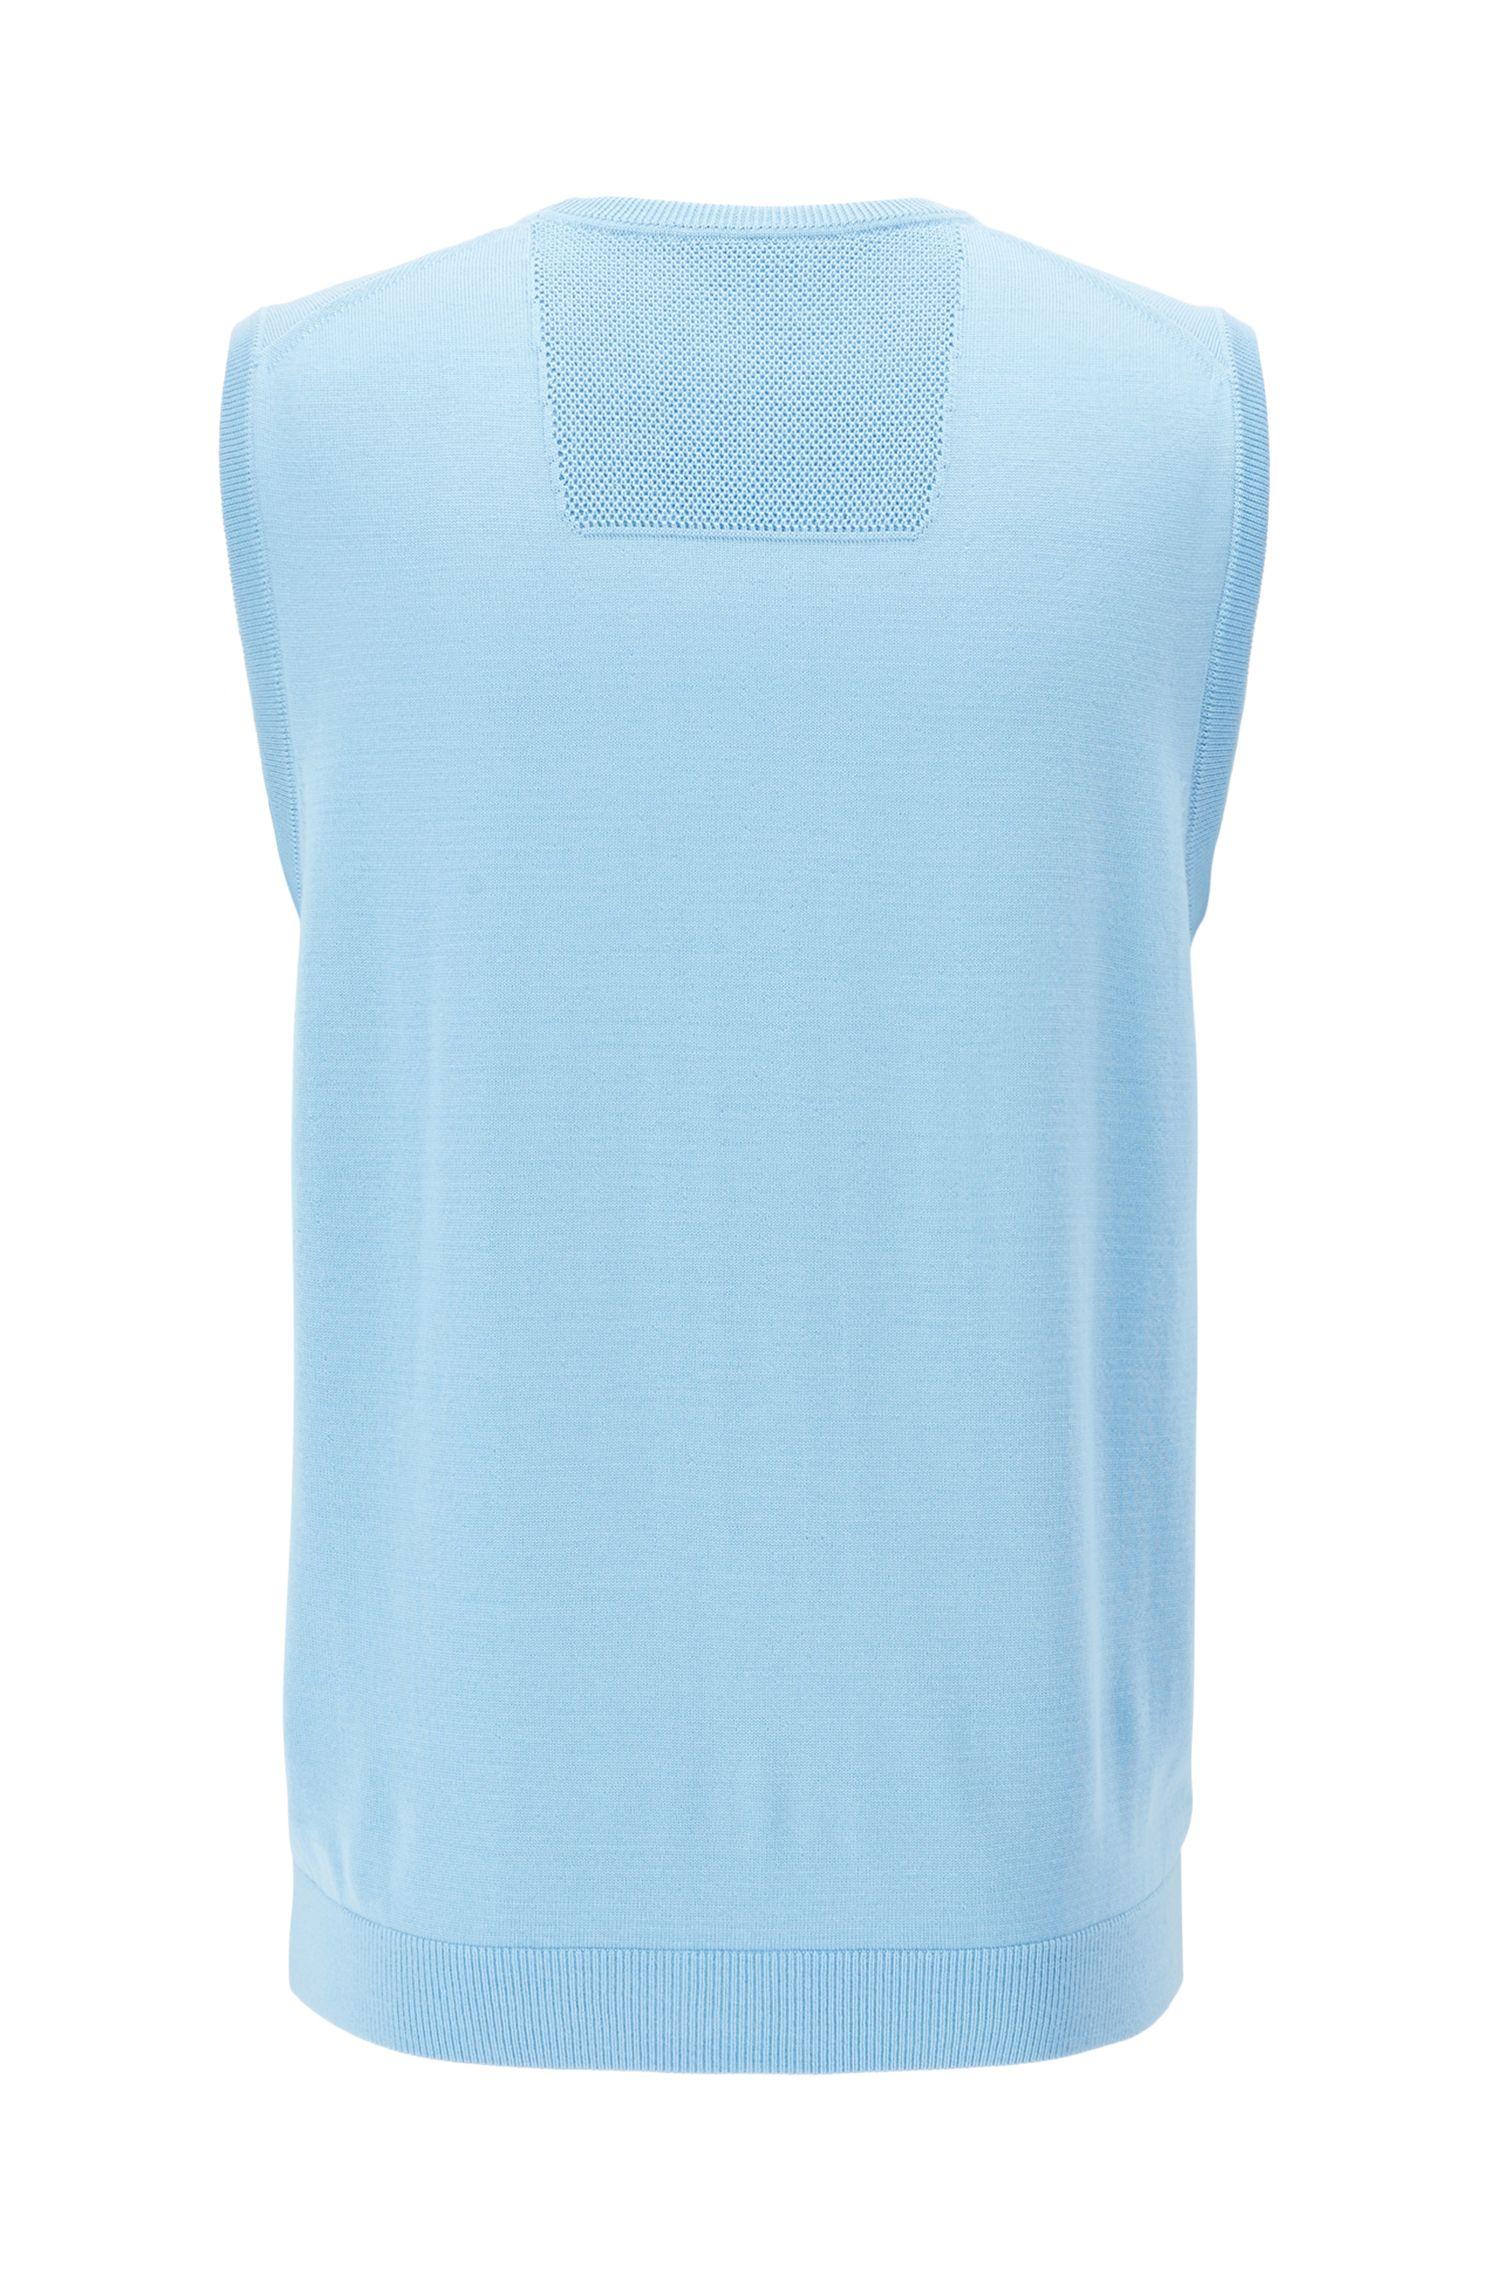 Knitted vest in water-repellent virgin wool